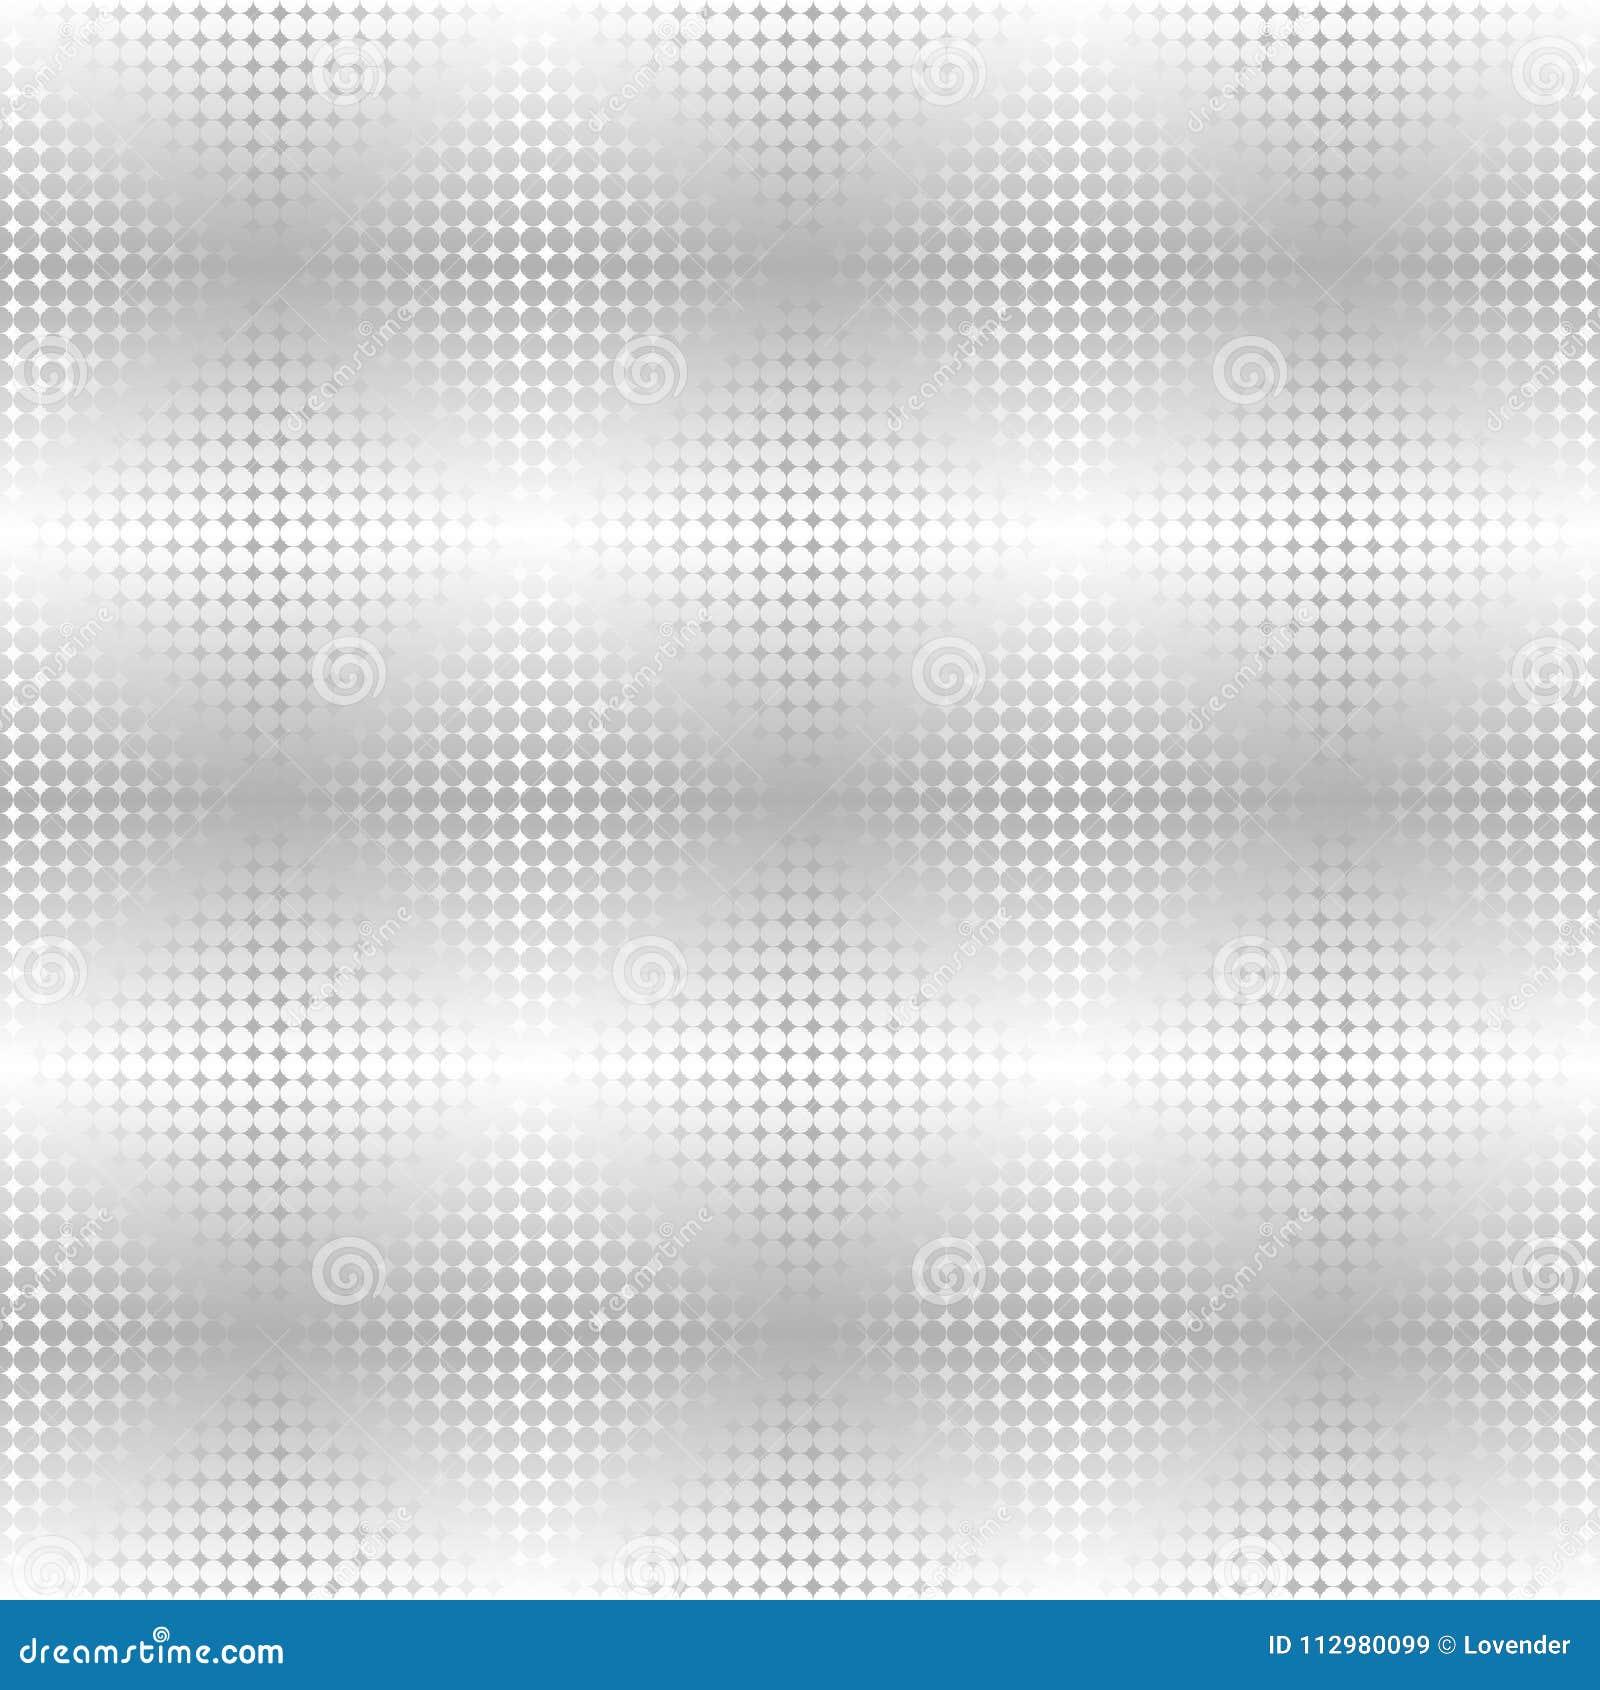 Silver metallic star pattern. Vector seamless background